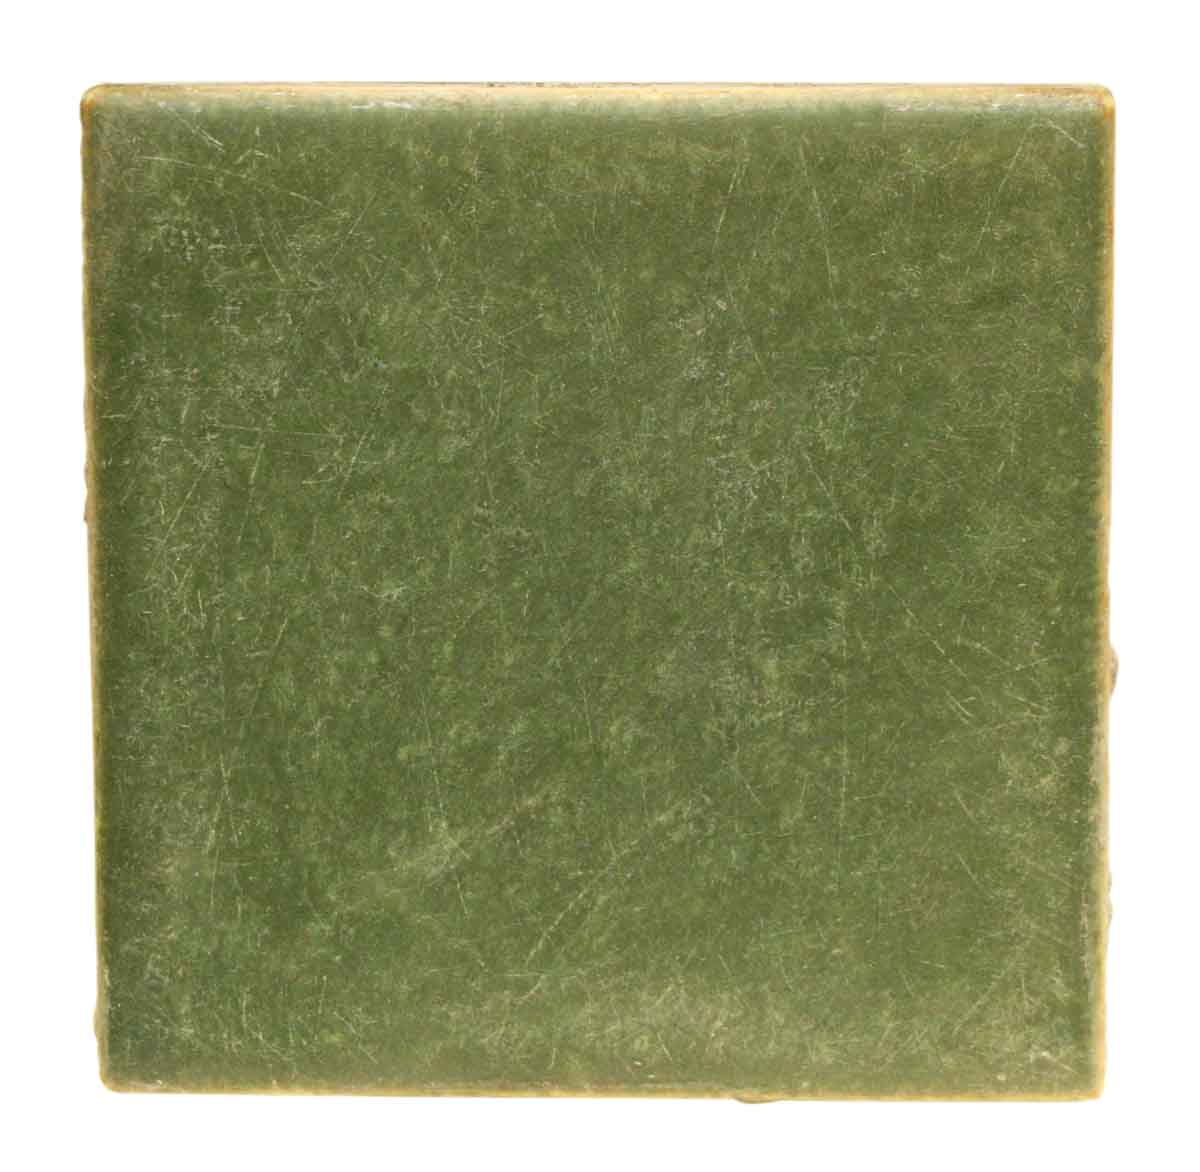 Antique Solid Green Tile